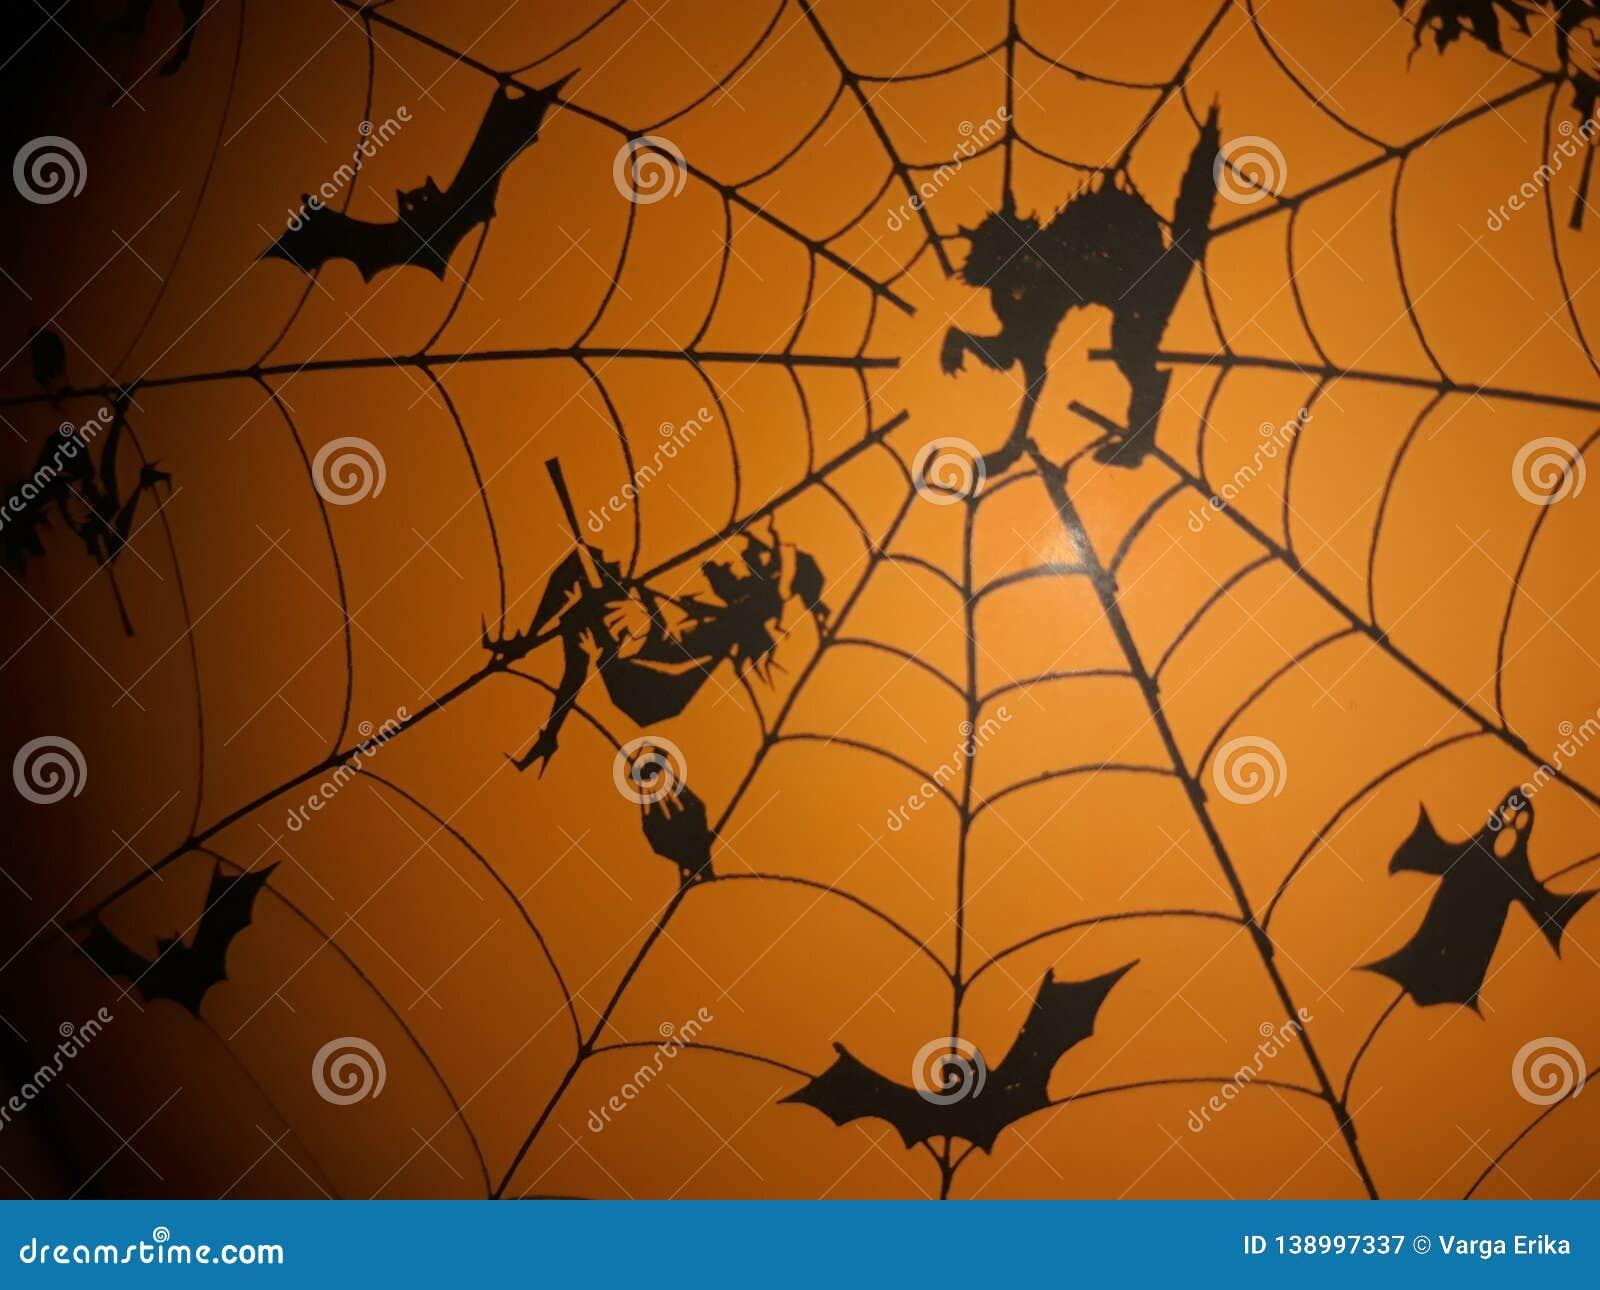 Carnival Halloween Theme.Orange Background With Carnival Halloween Theme Stock Image